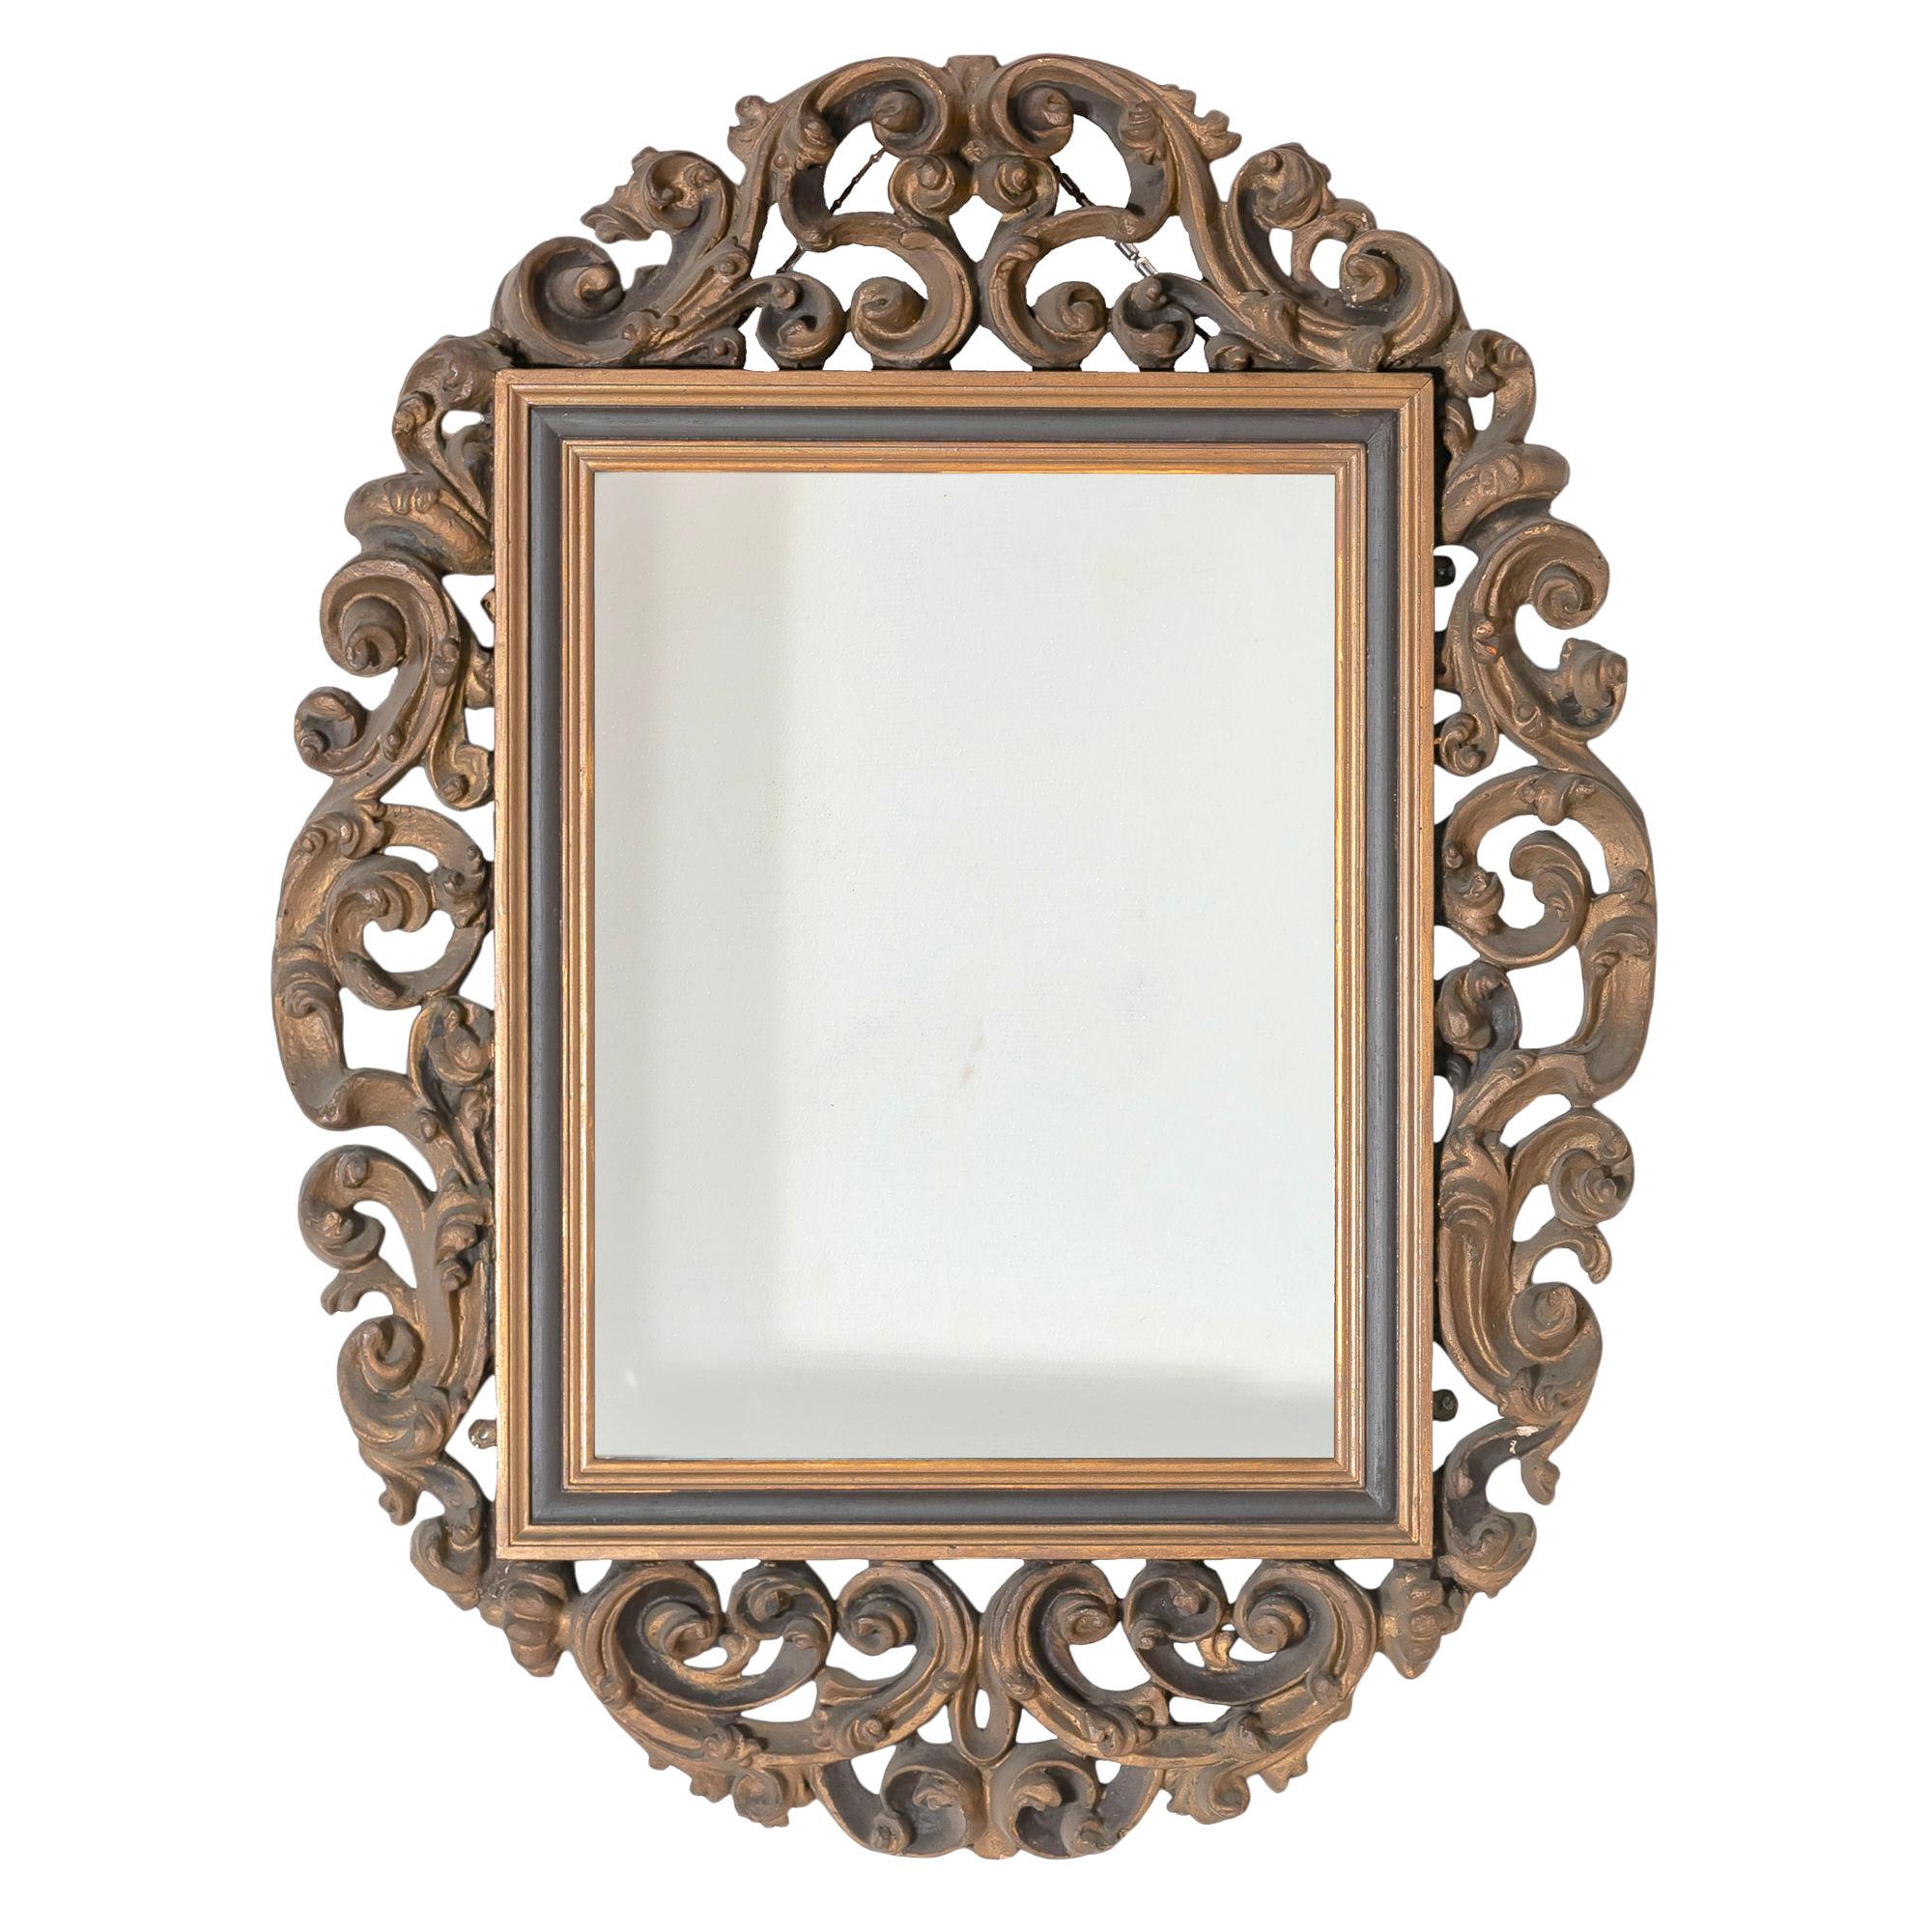 'Moulded Gesso Foliate Scroll Framed Wall Mirror 20th Century'